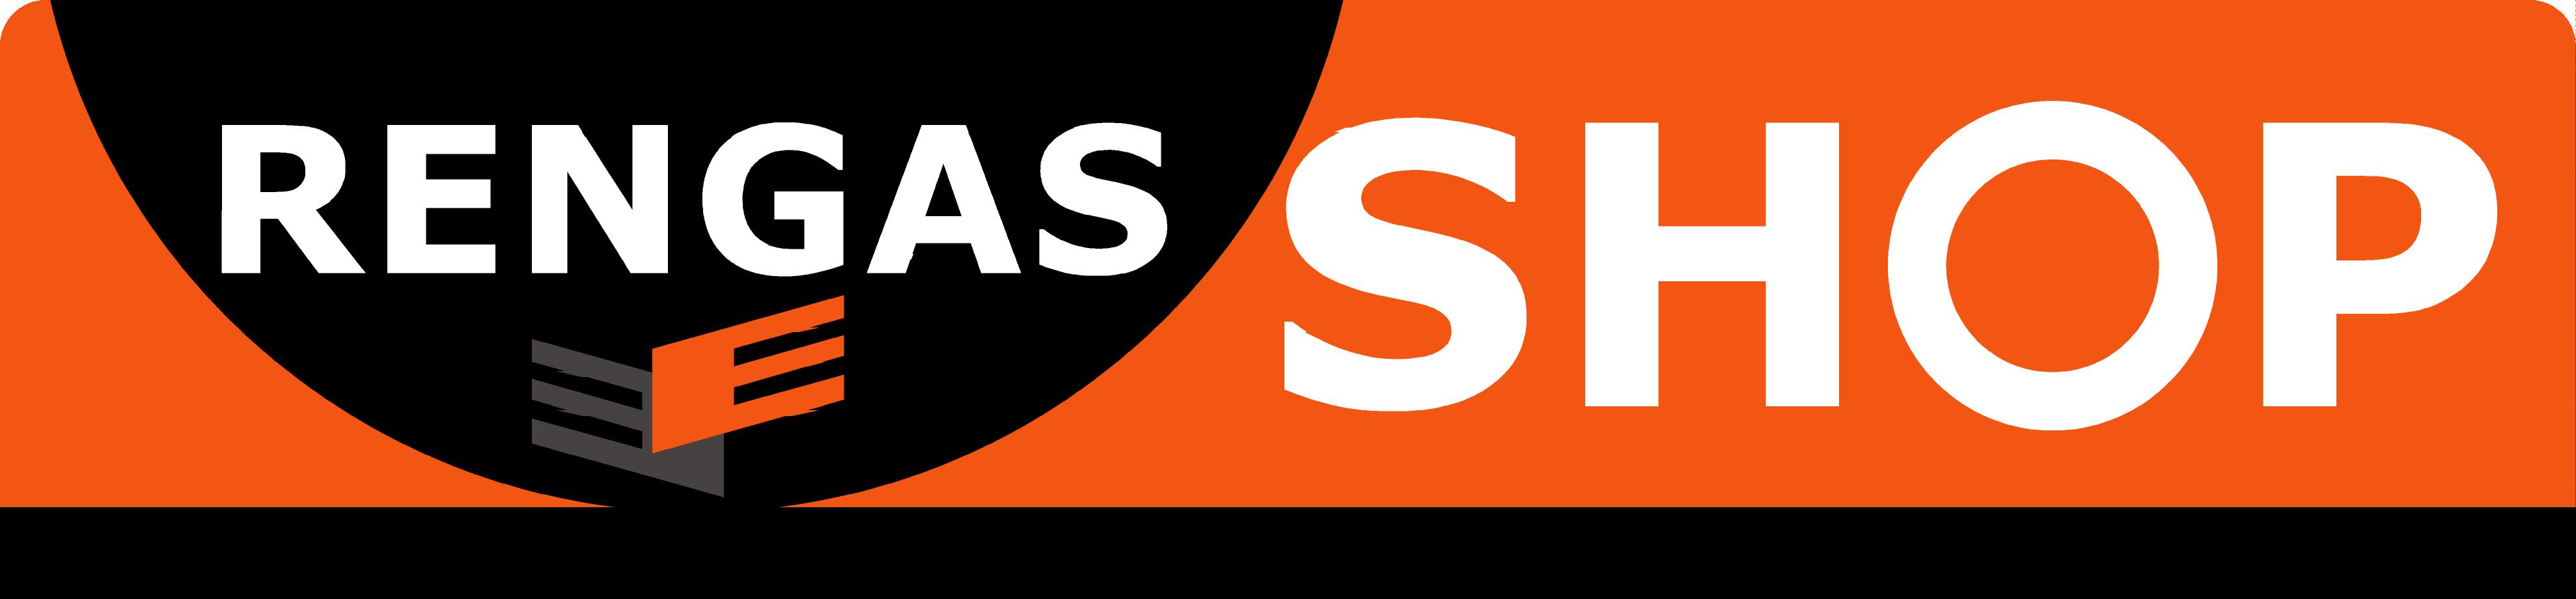 Rengas Shop logo